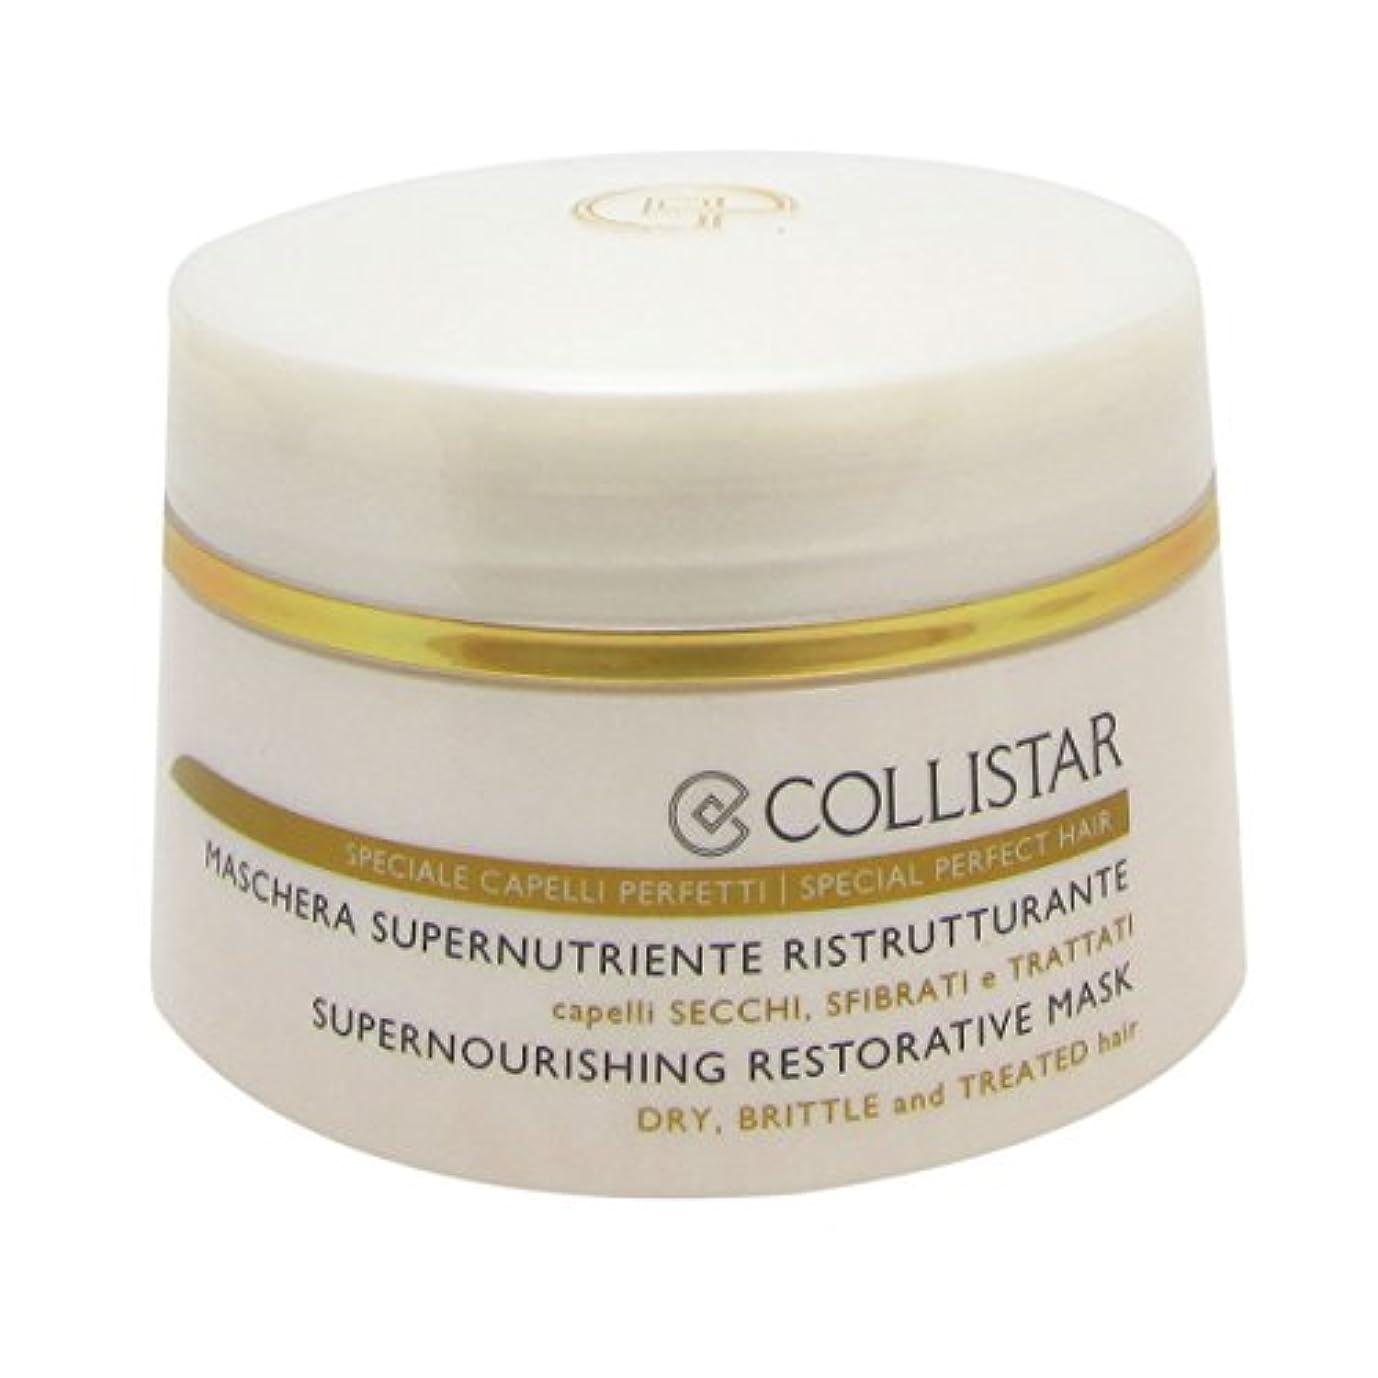 Collistar Supernourishing Restorative Mask 200ml [並行輸入品]